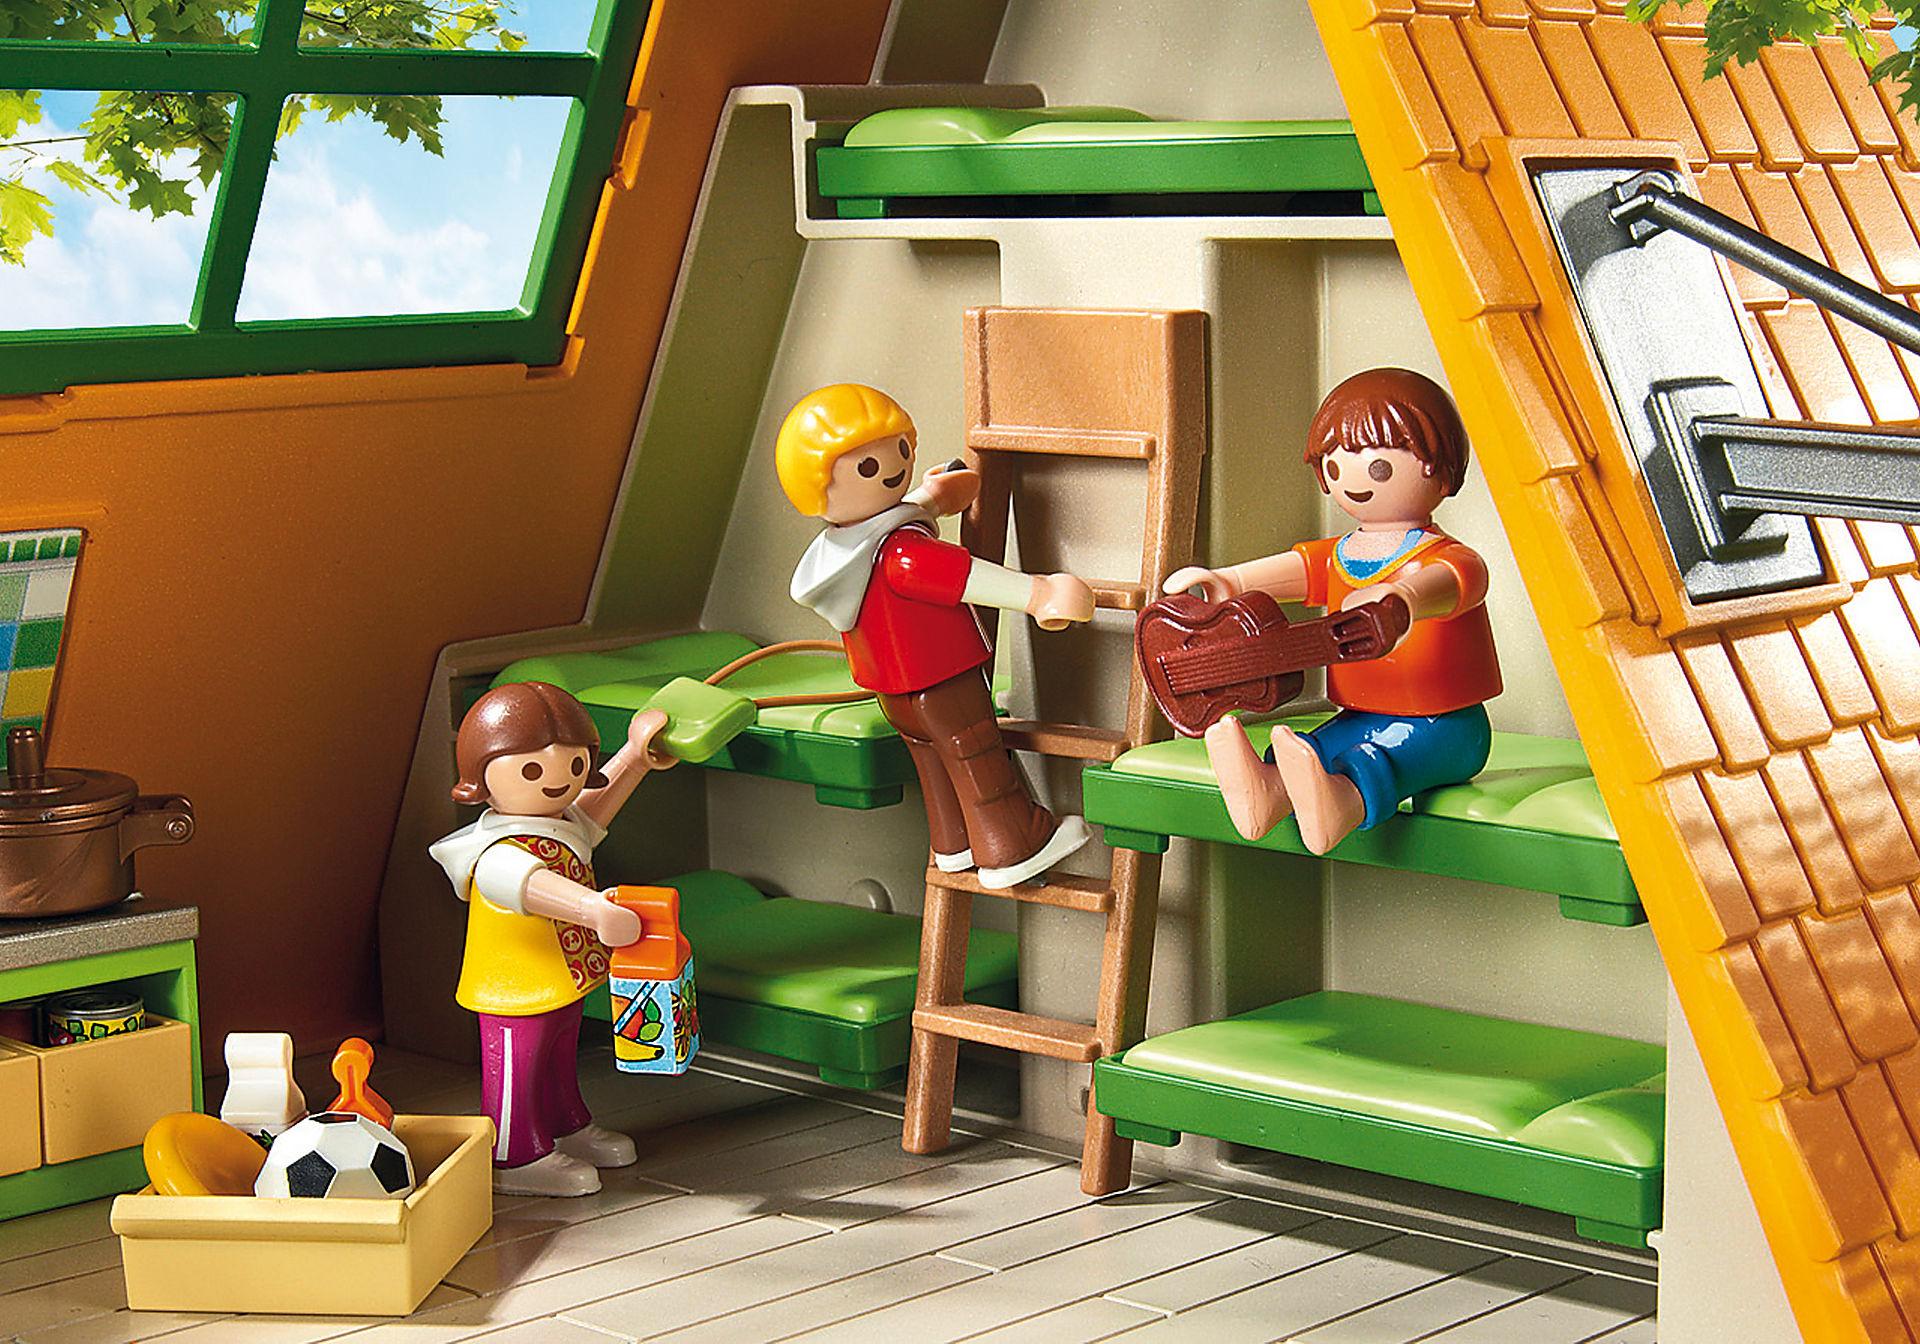 http://media.playmobil.com/i/playmobil/6887_product_extra2/Grote vakantiebungalow